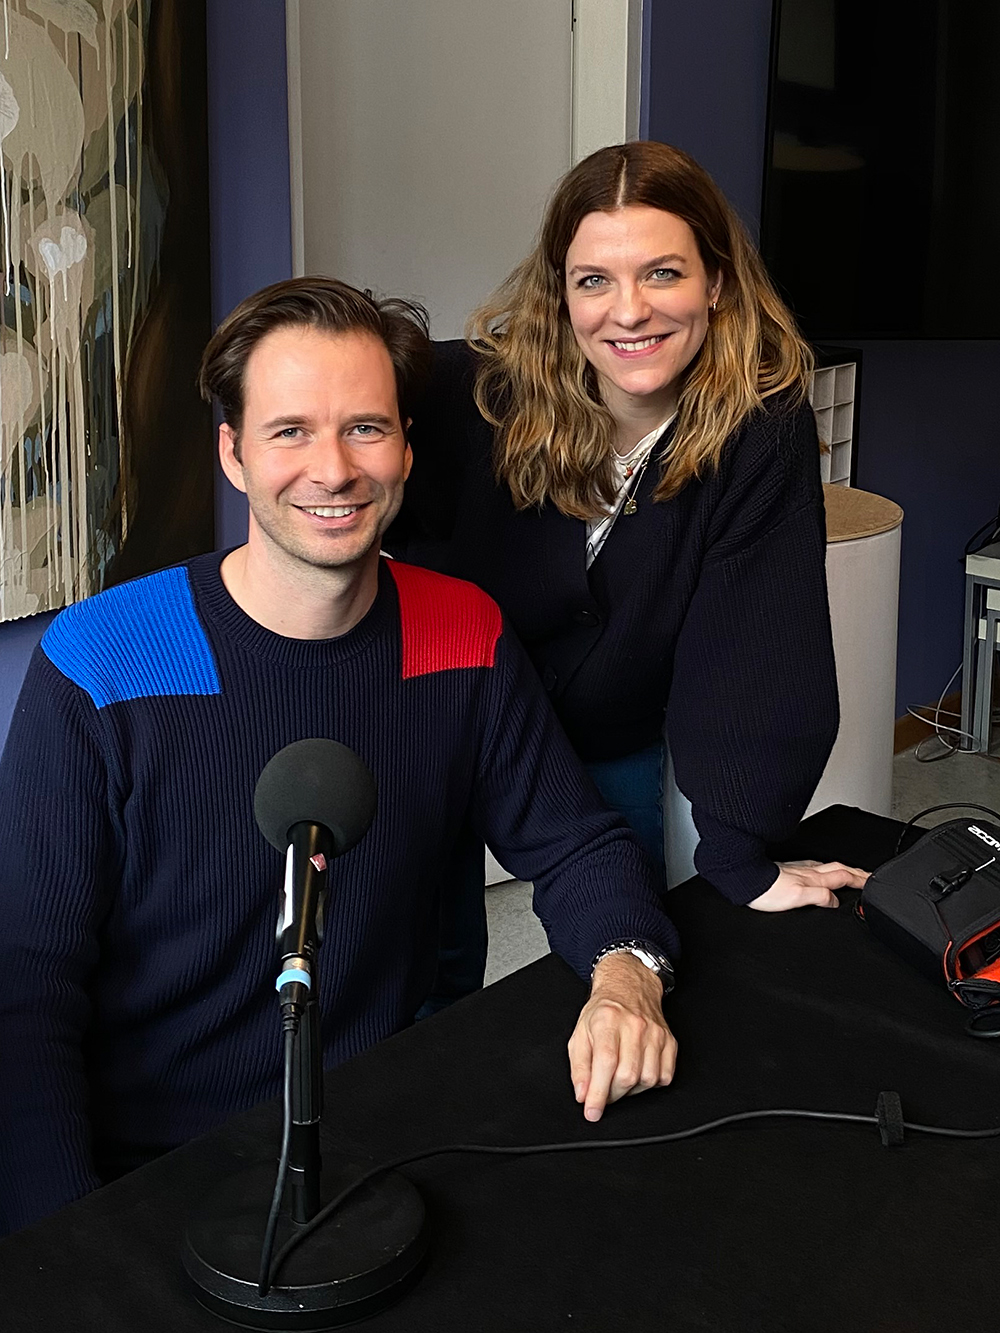 Hanna Schumi Gepflegte Gespräche Beauty Podcast Team Dr. Jospeh